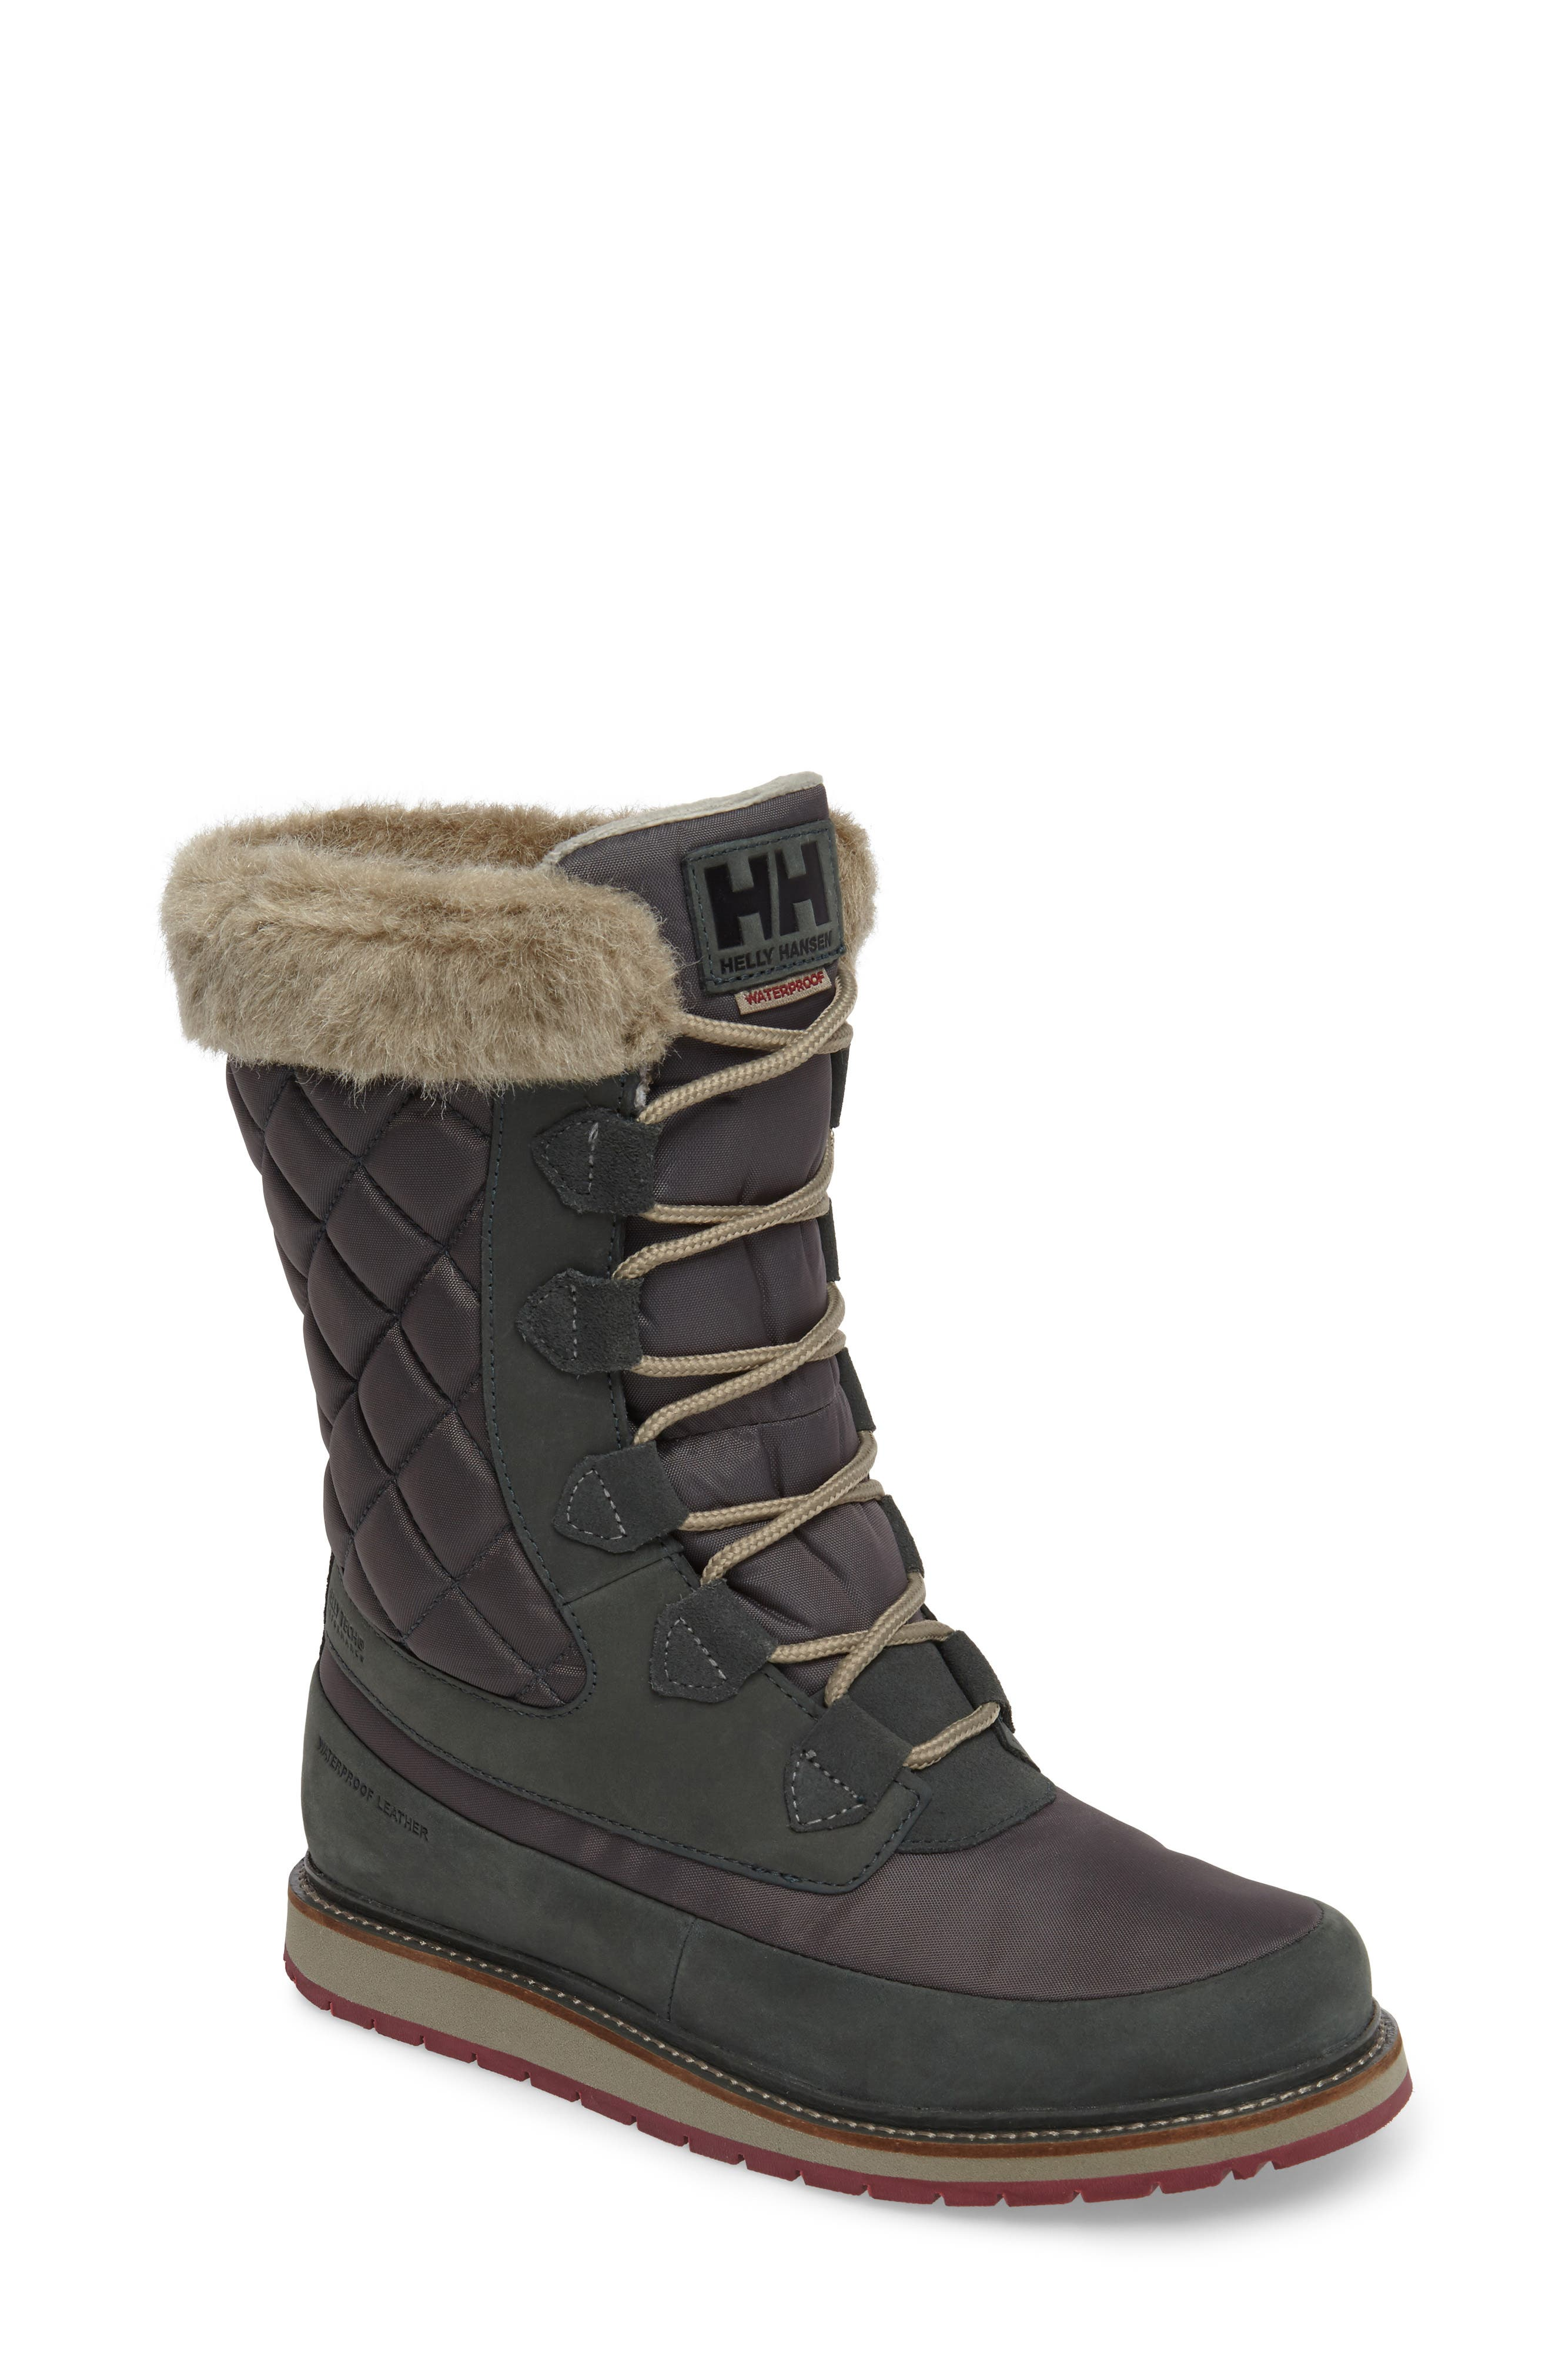 Arosa Waterproof Boot with Faux Fur Trim,                         Main,                         color, Darkest Spruce / Rock / La